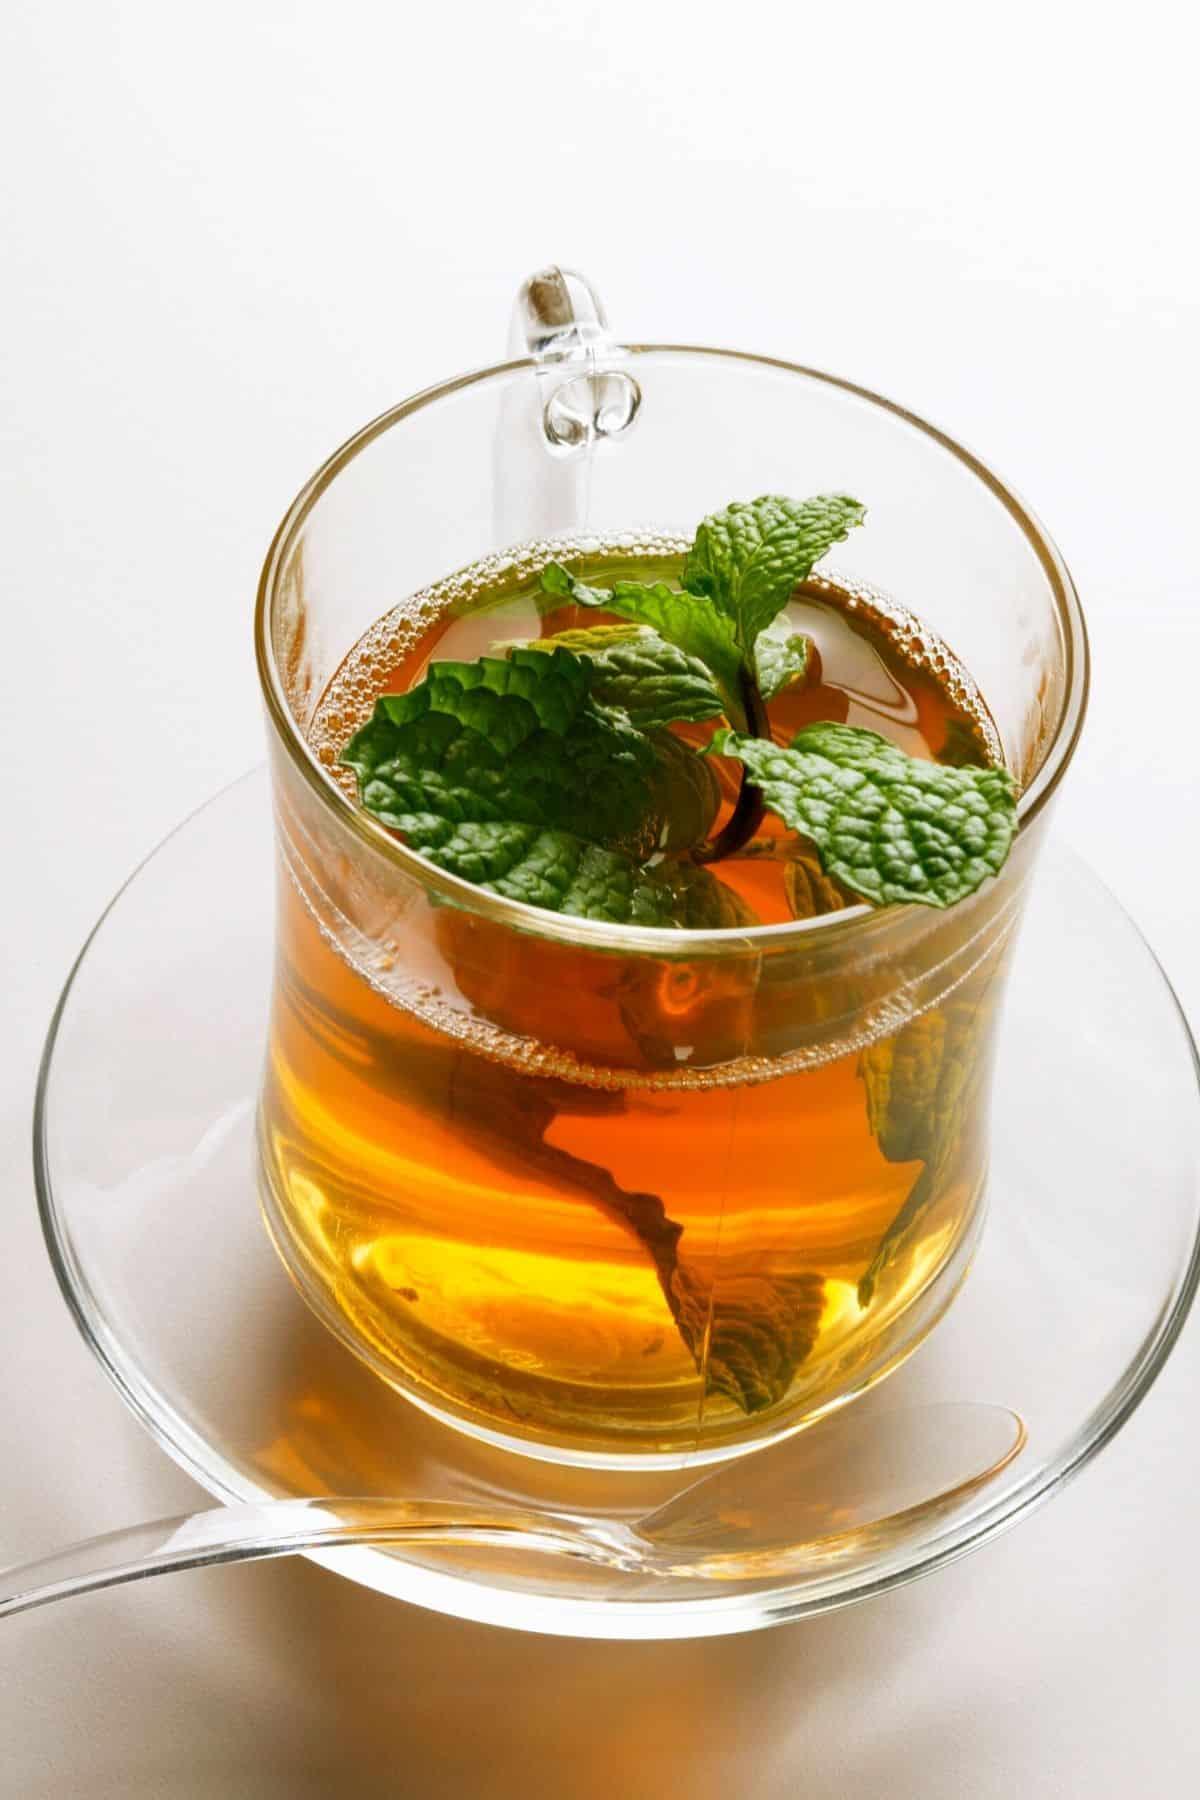 mug of peppermint tea